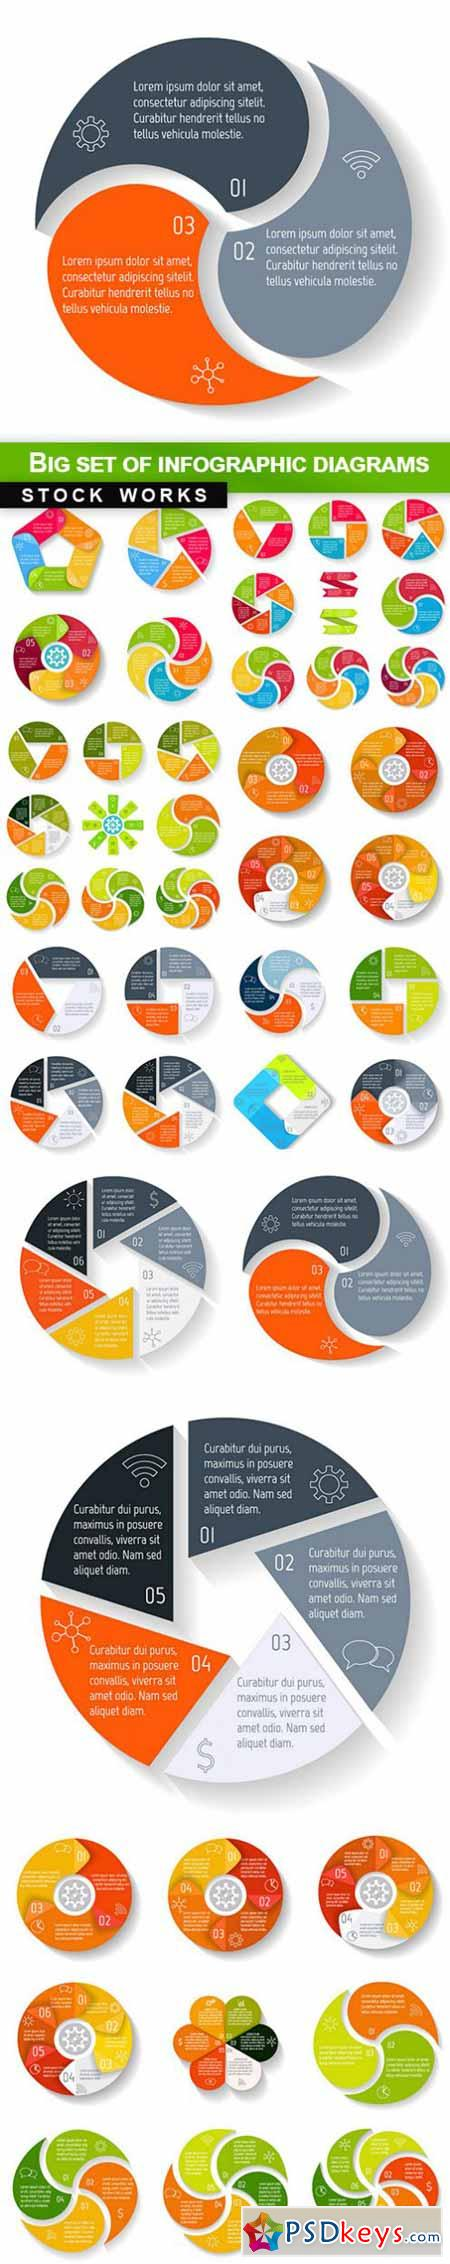 Big set of infographic diagrams - 10 EPS